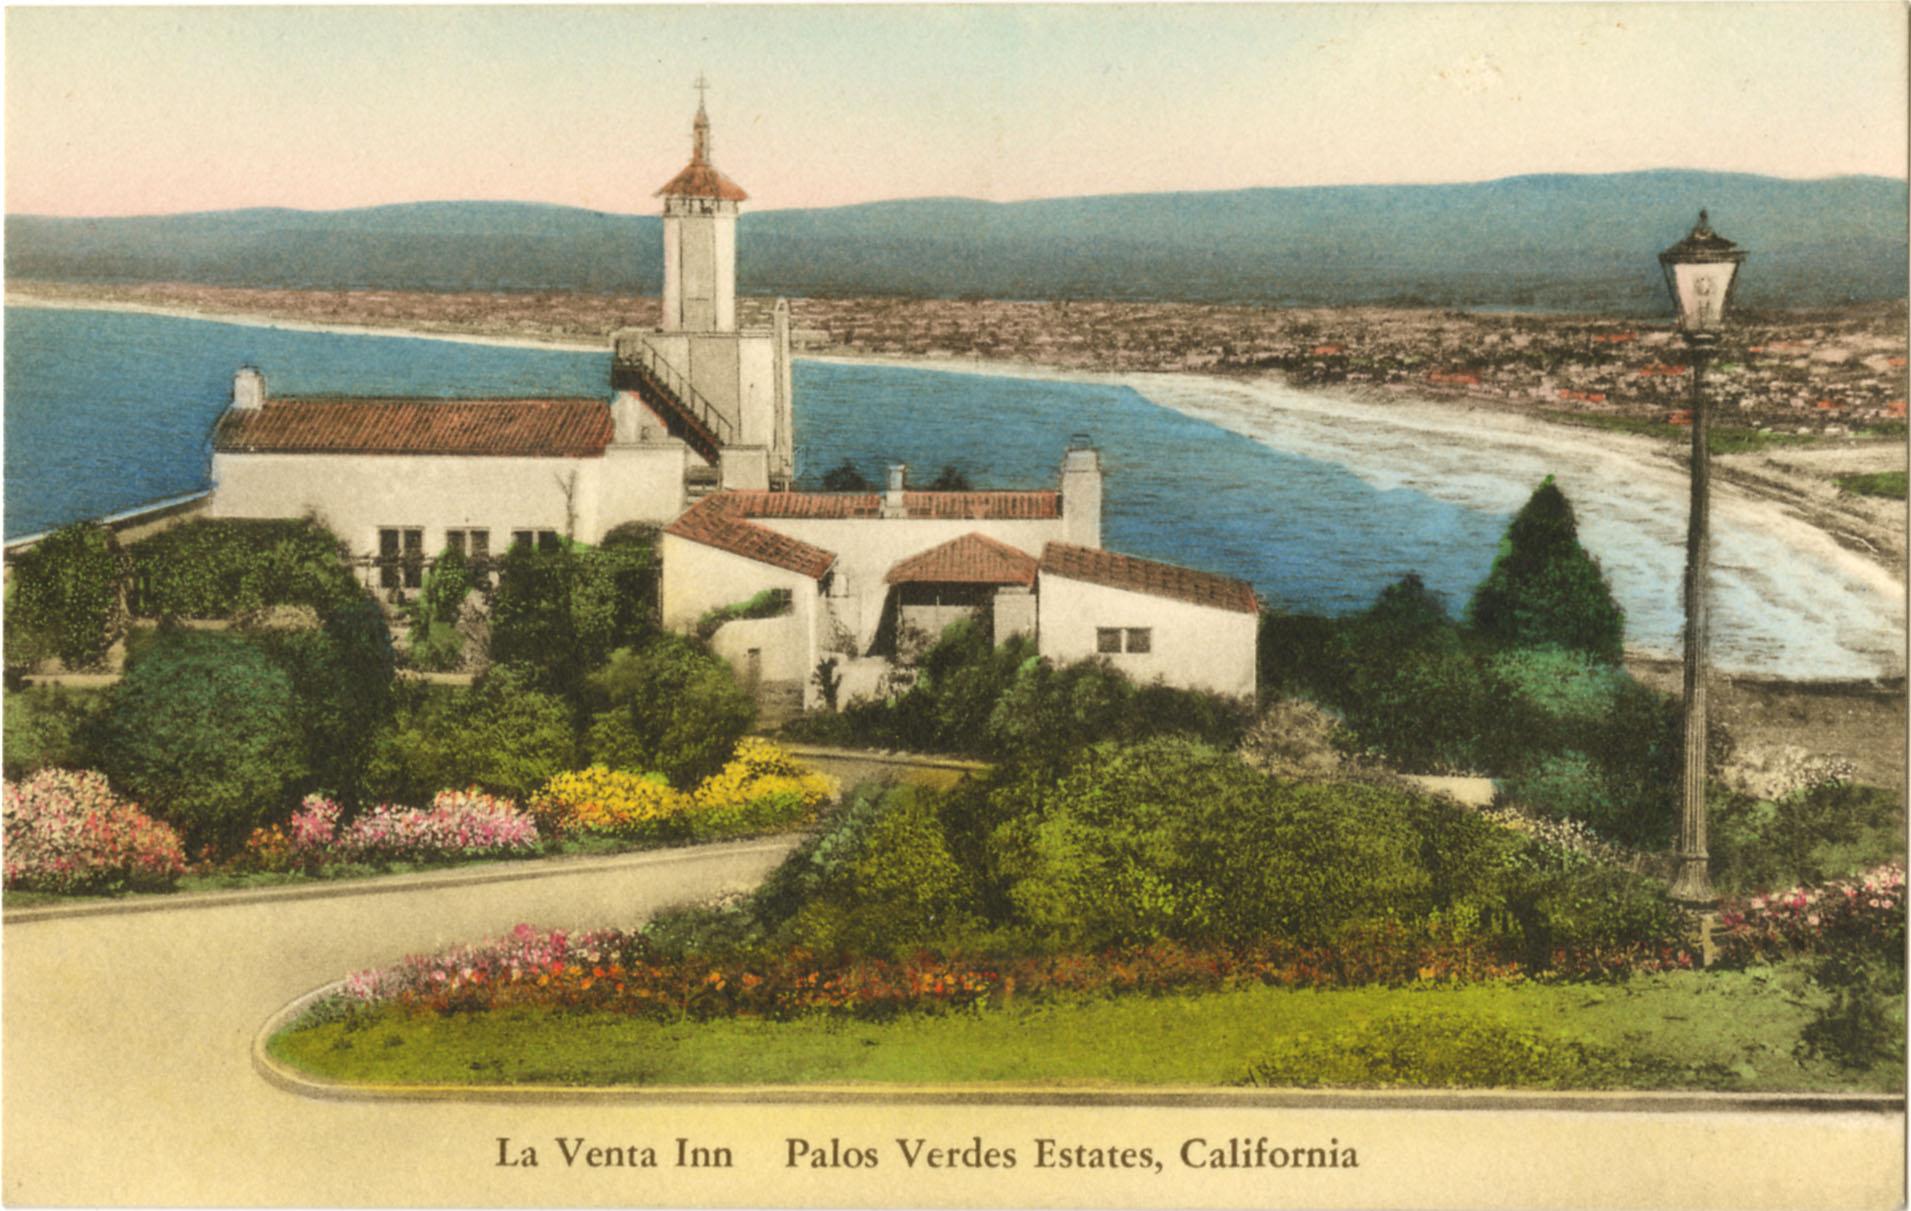 Postcard drawing of La Venta Inn